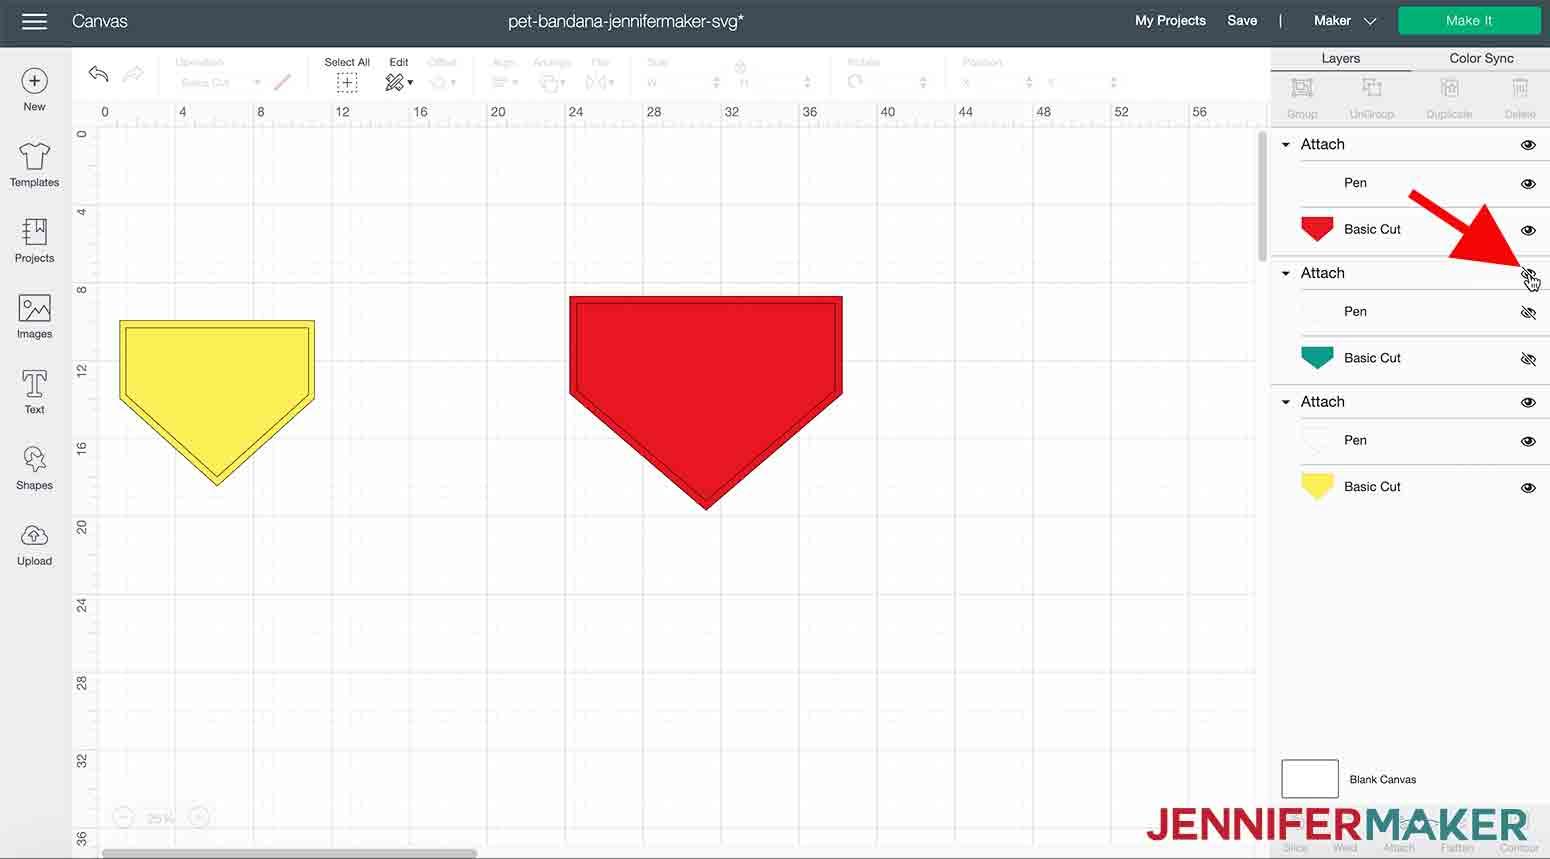 arrow pointing to eye icon in cricut design space to hide pet bandana jennifermaker